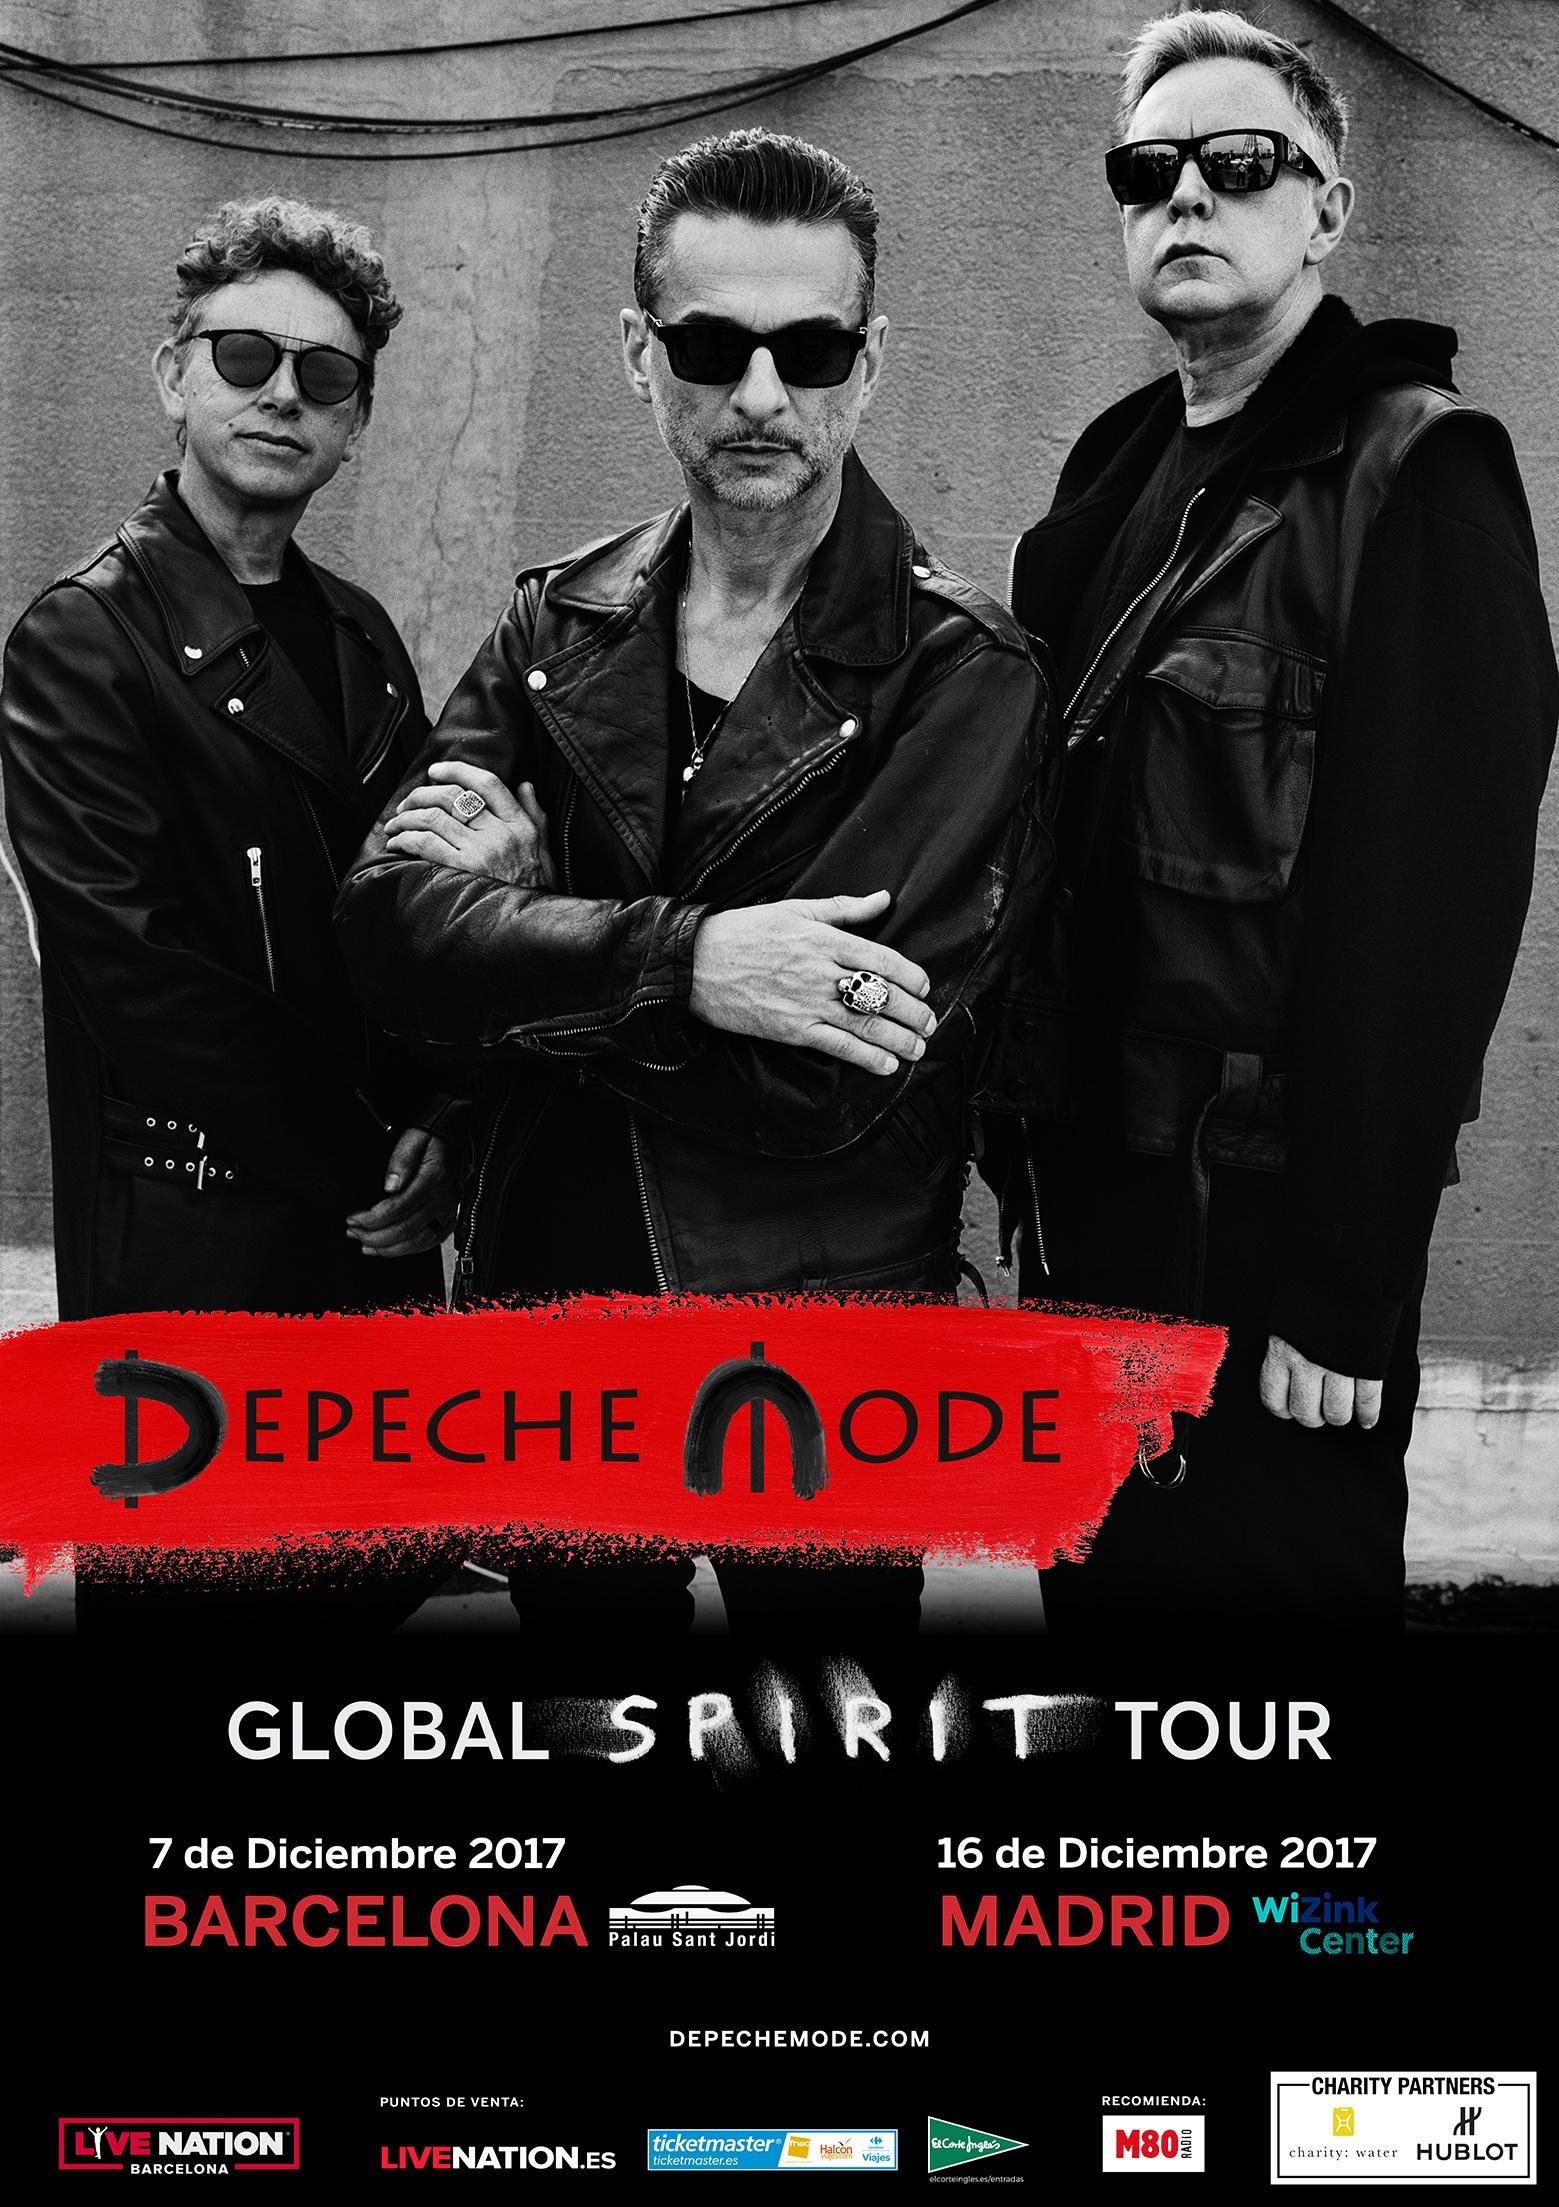 "Depeche Mode anuncia nuevas fechas de la gira ""The Global Spirit Tour"" en Barcelona y Madrid"